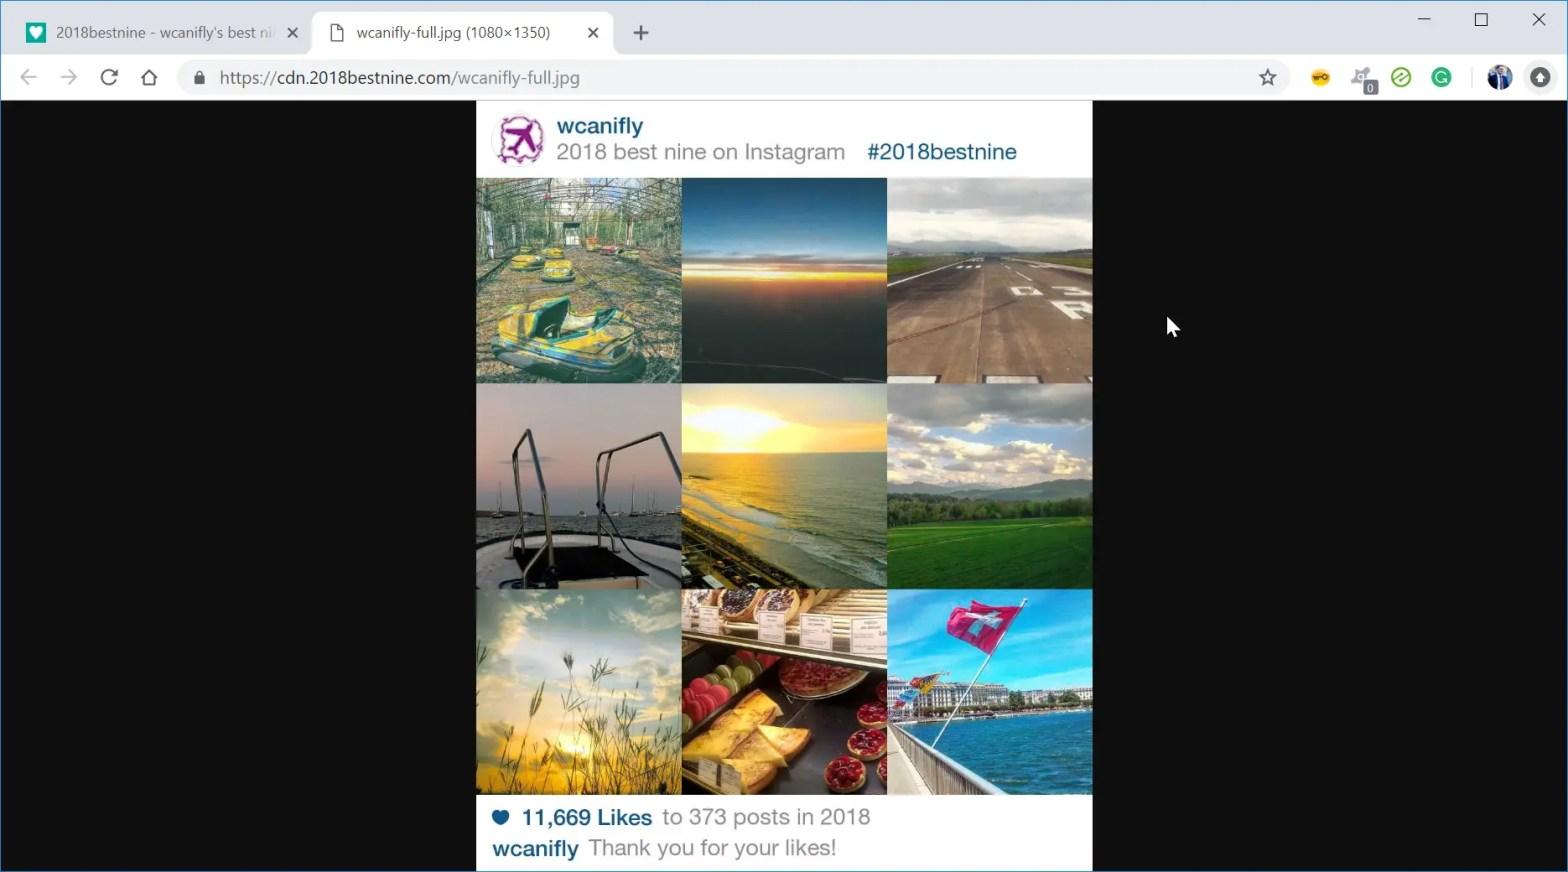 How to make an Instagram best nine